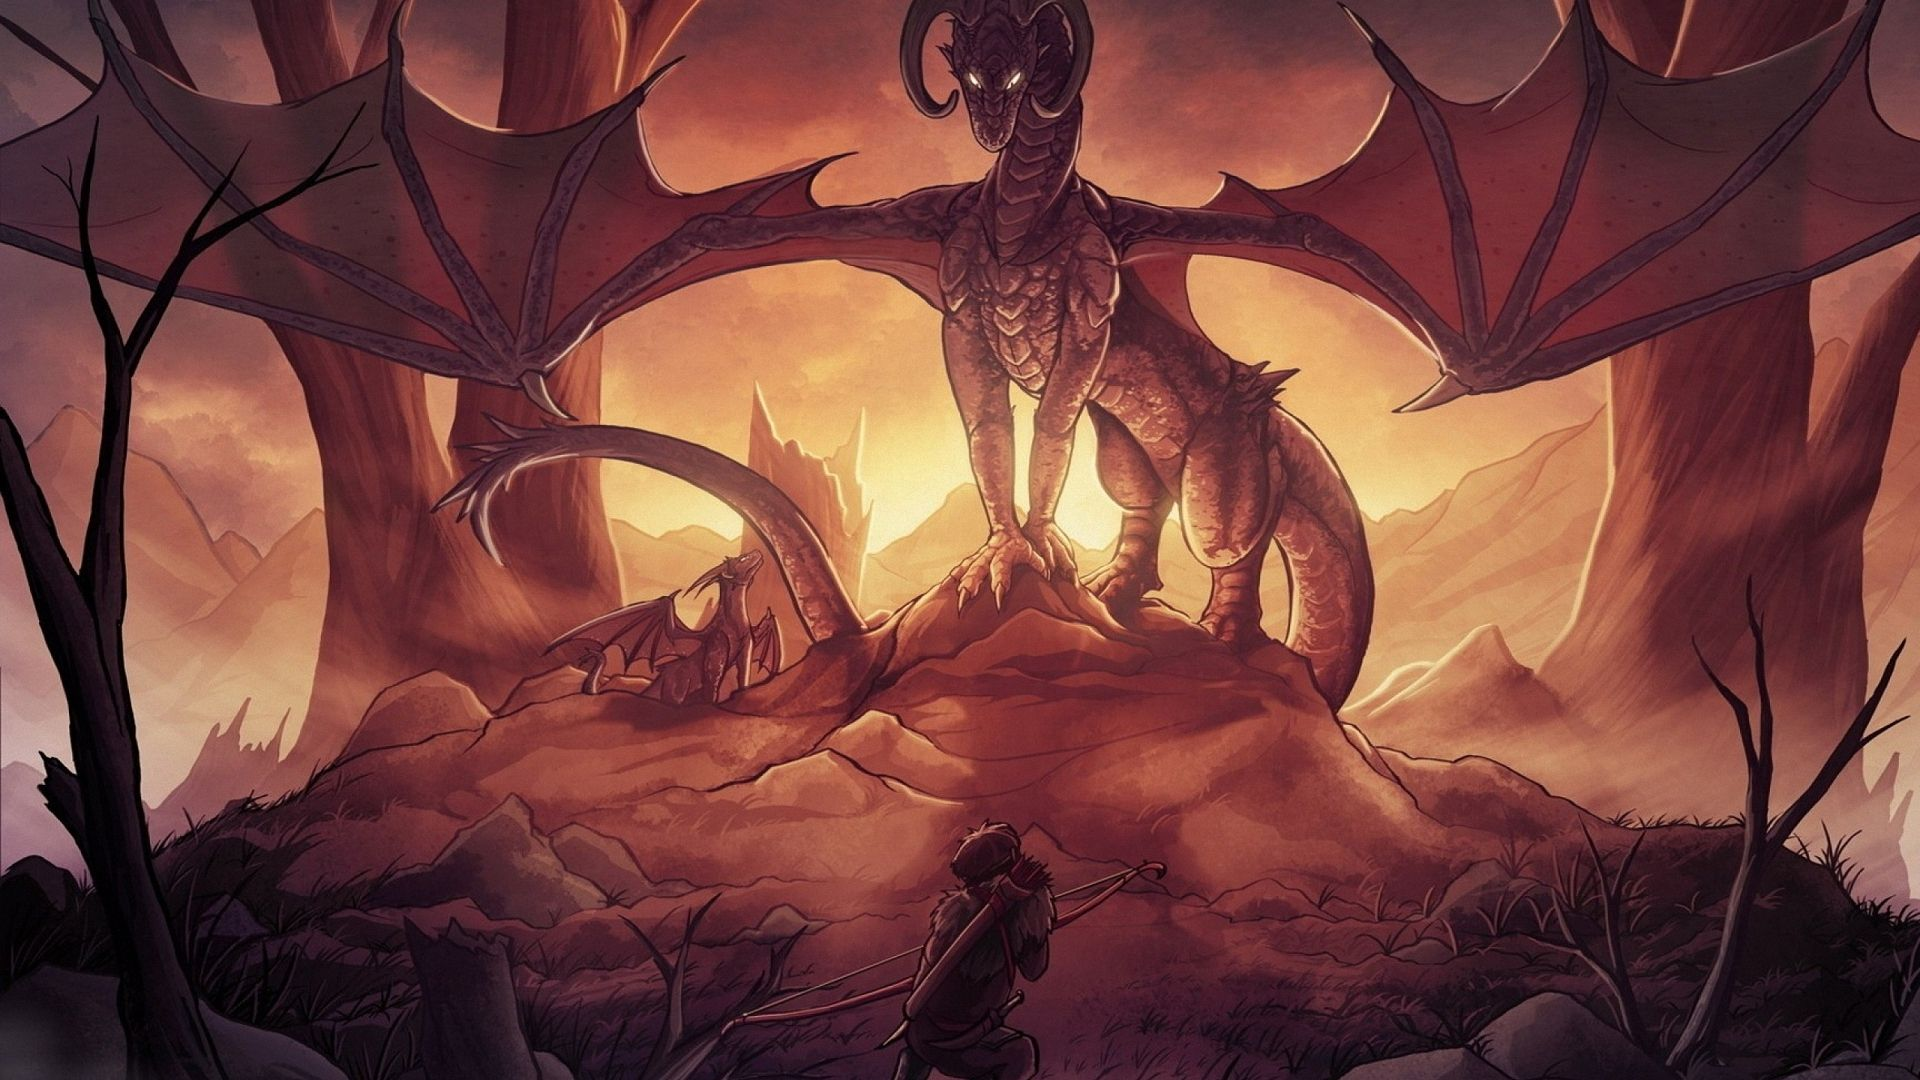 1920x1080 Wing Dragon Fantasy Hd Wallpapers 1080p Fantasy Dragon Fantasy Dragon Wings